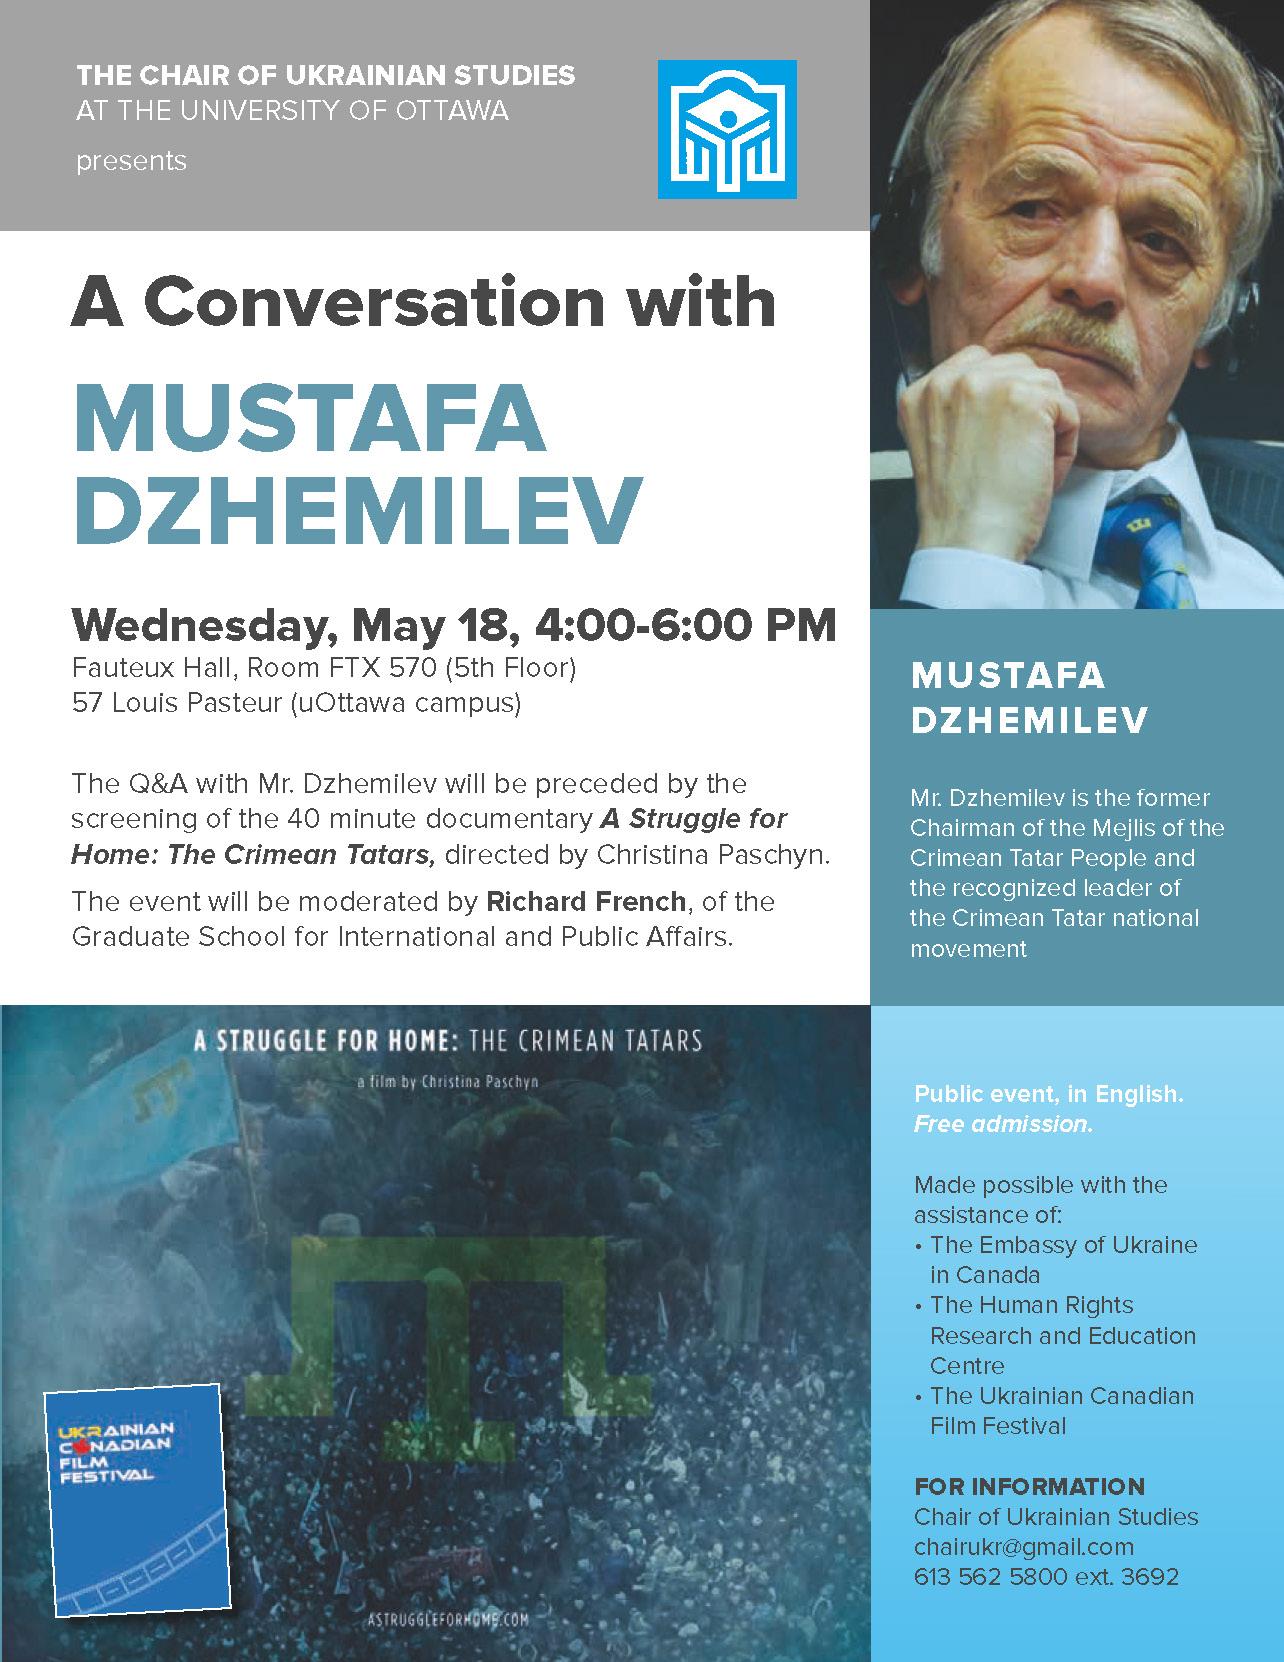 Une conversation avec Mustafa Dzhemilev